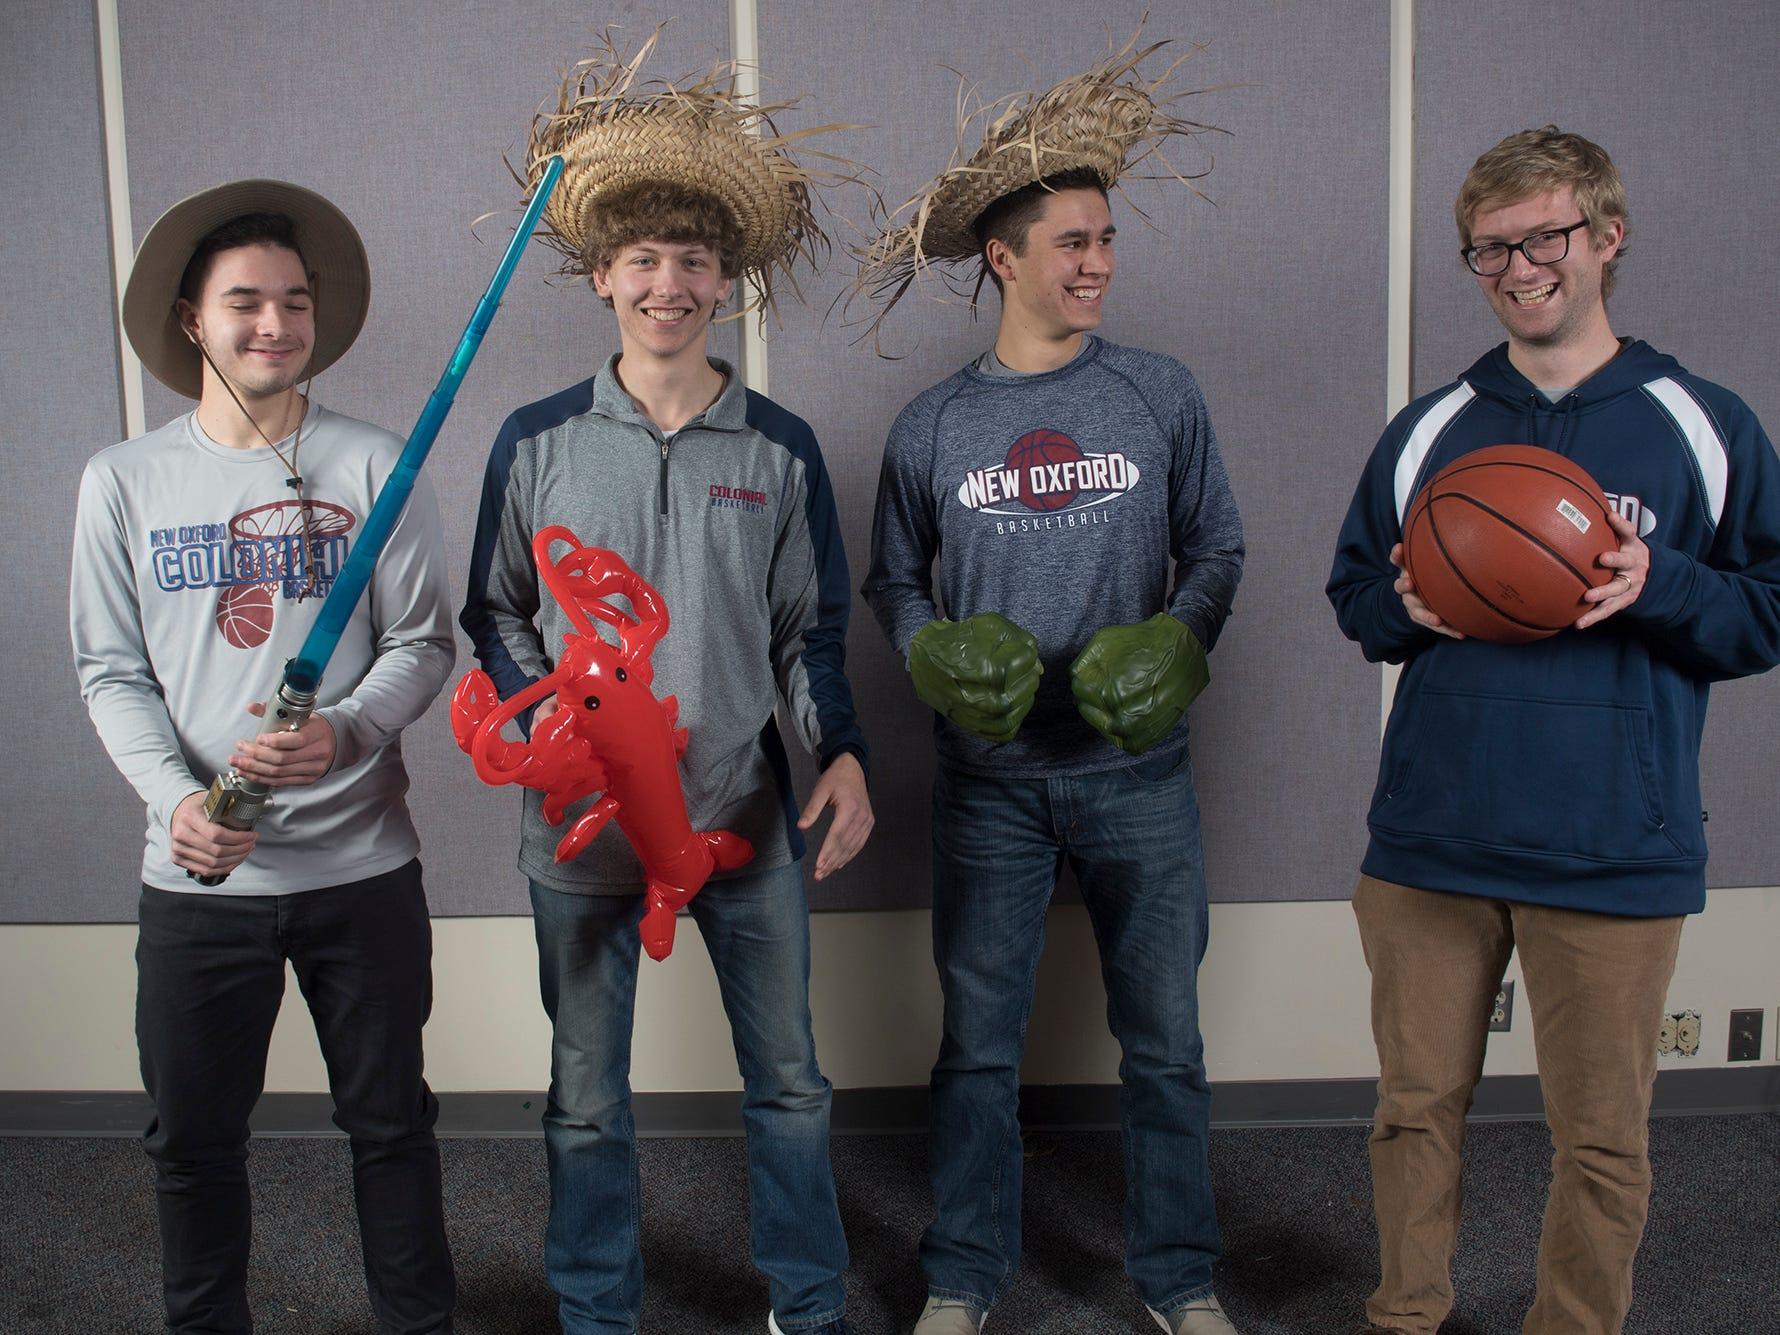 Cameron Krebs, Jaren Rex, Justin Gruver and Sean Bair, with the New Oxford Basketball team, pose during the 2018-19 GameTimePa YAIAA Winter Media Day Sunday November 11, 2018.